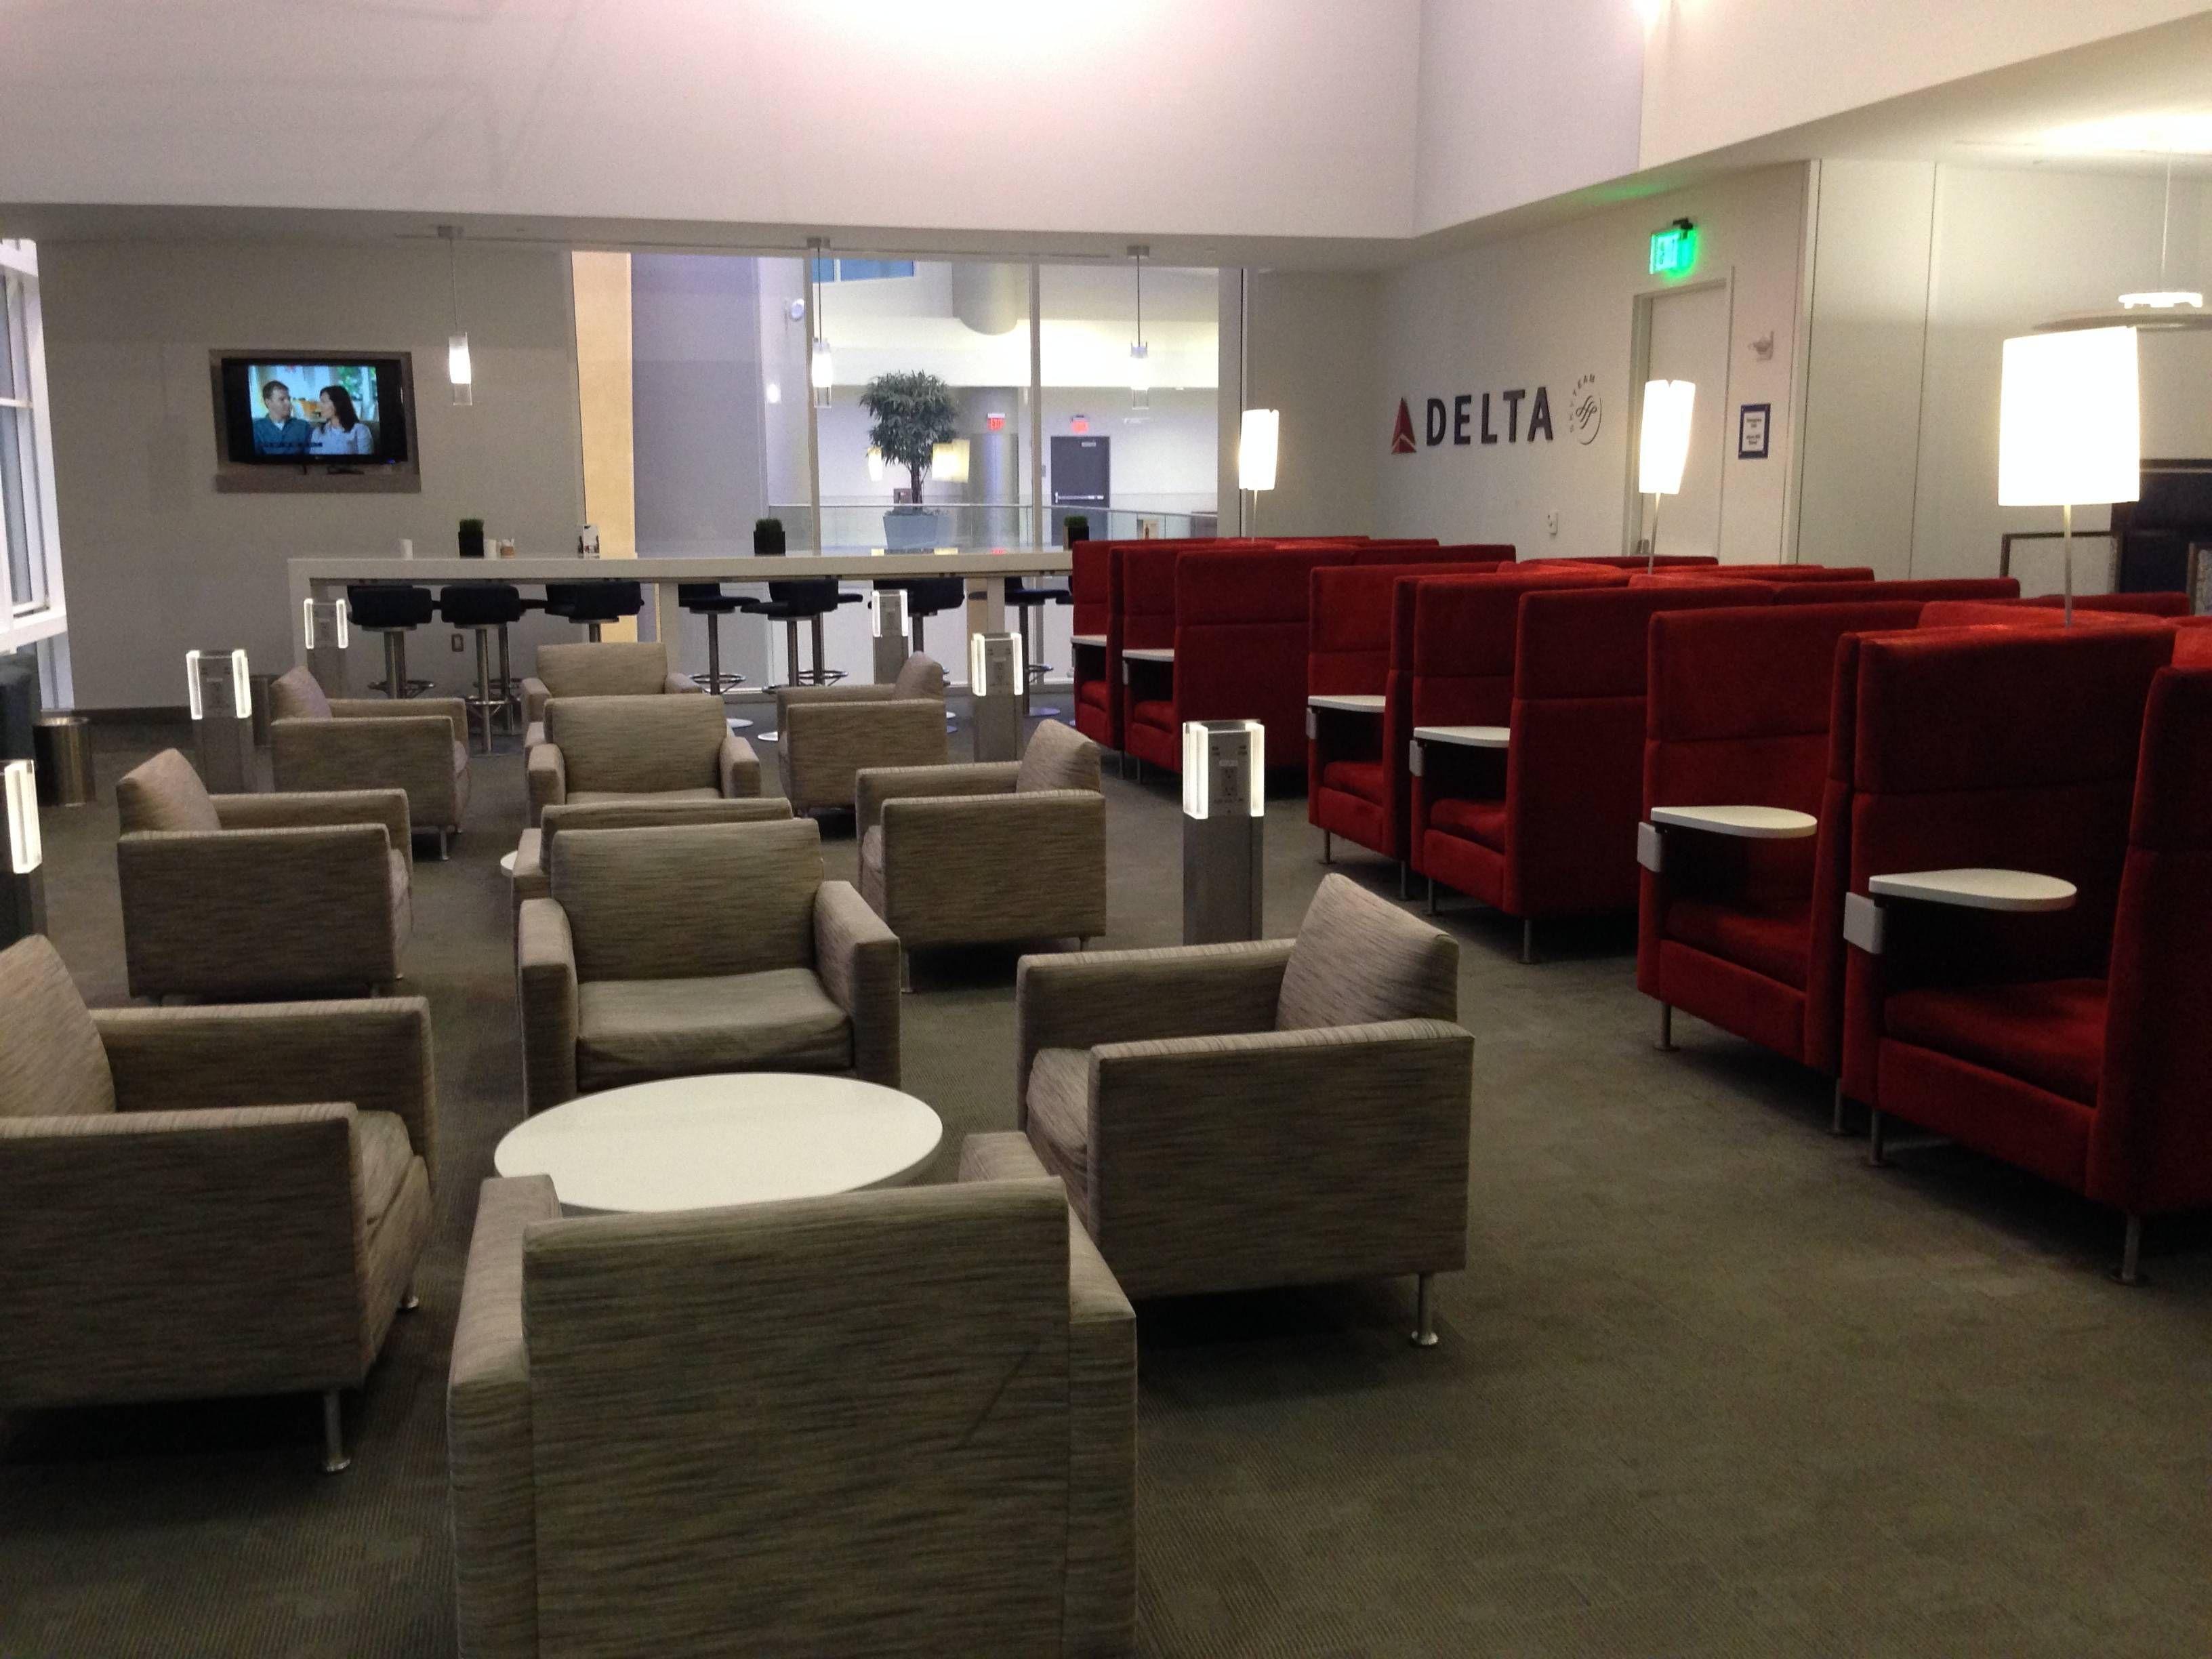 Delta SkyClub Sala VIP Atlanta Terminal F